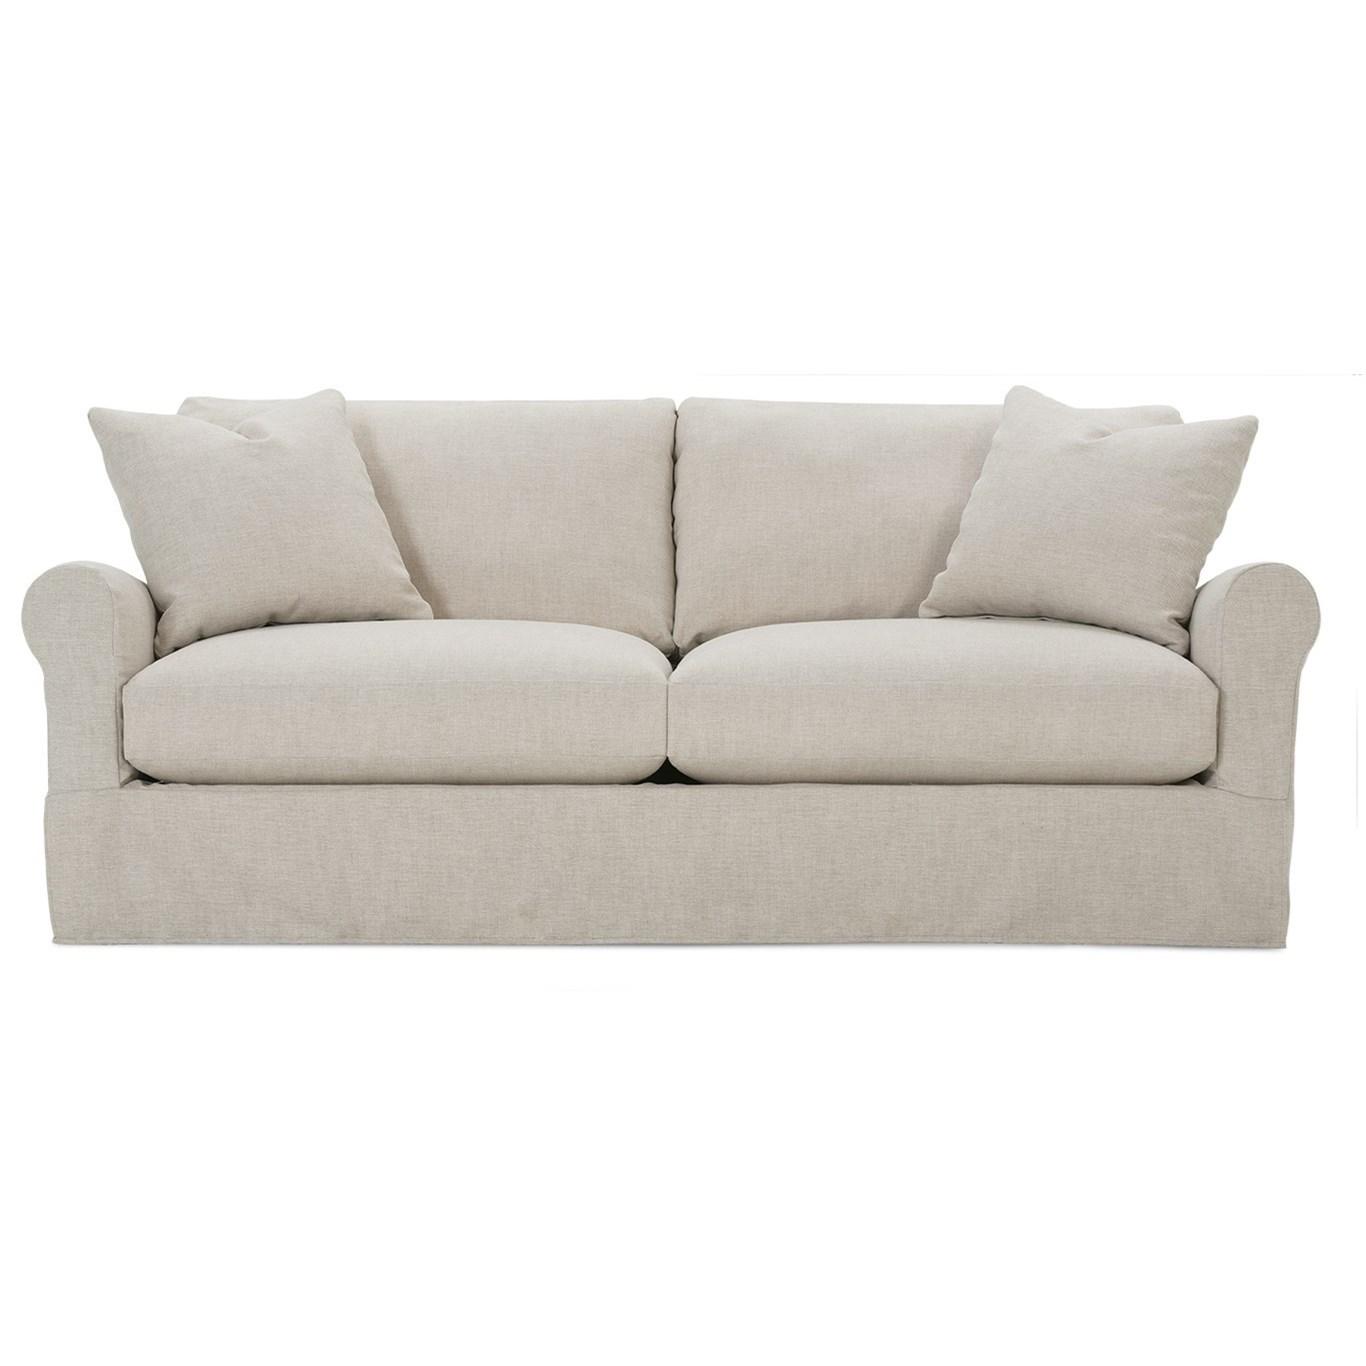 Aberdeen Slipcovered Sofa by Rowe at Bullard Furniture